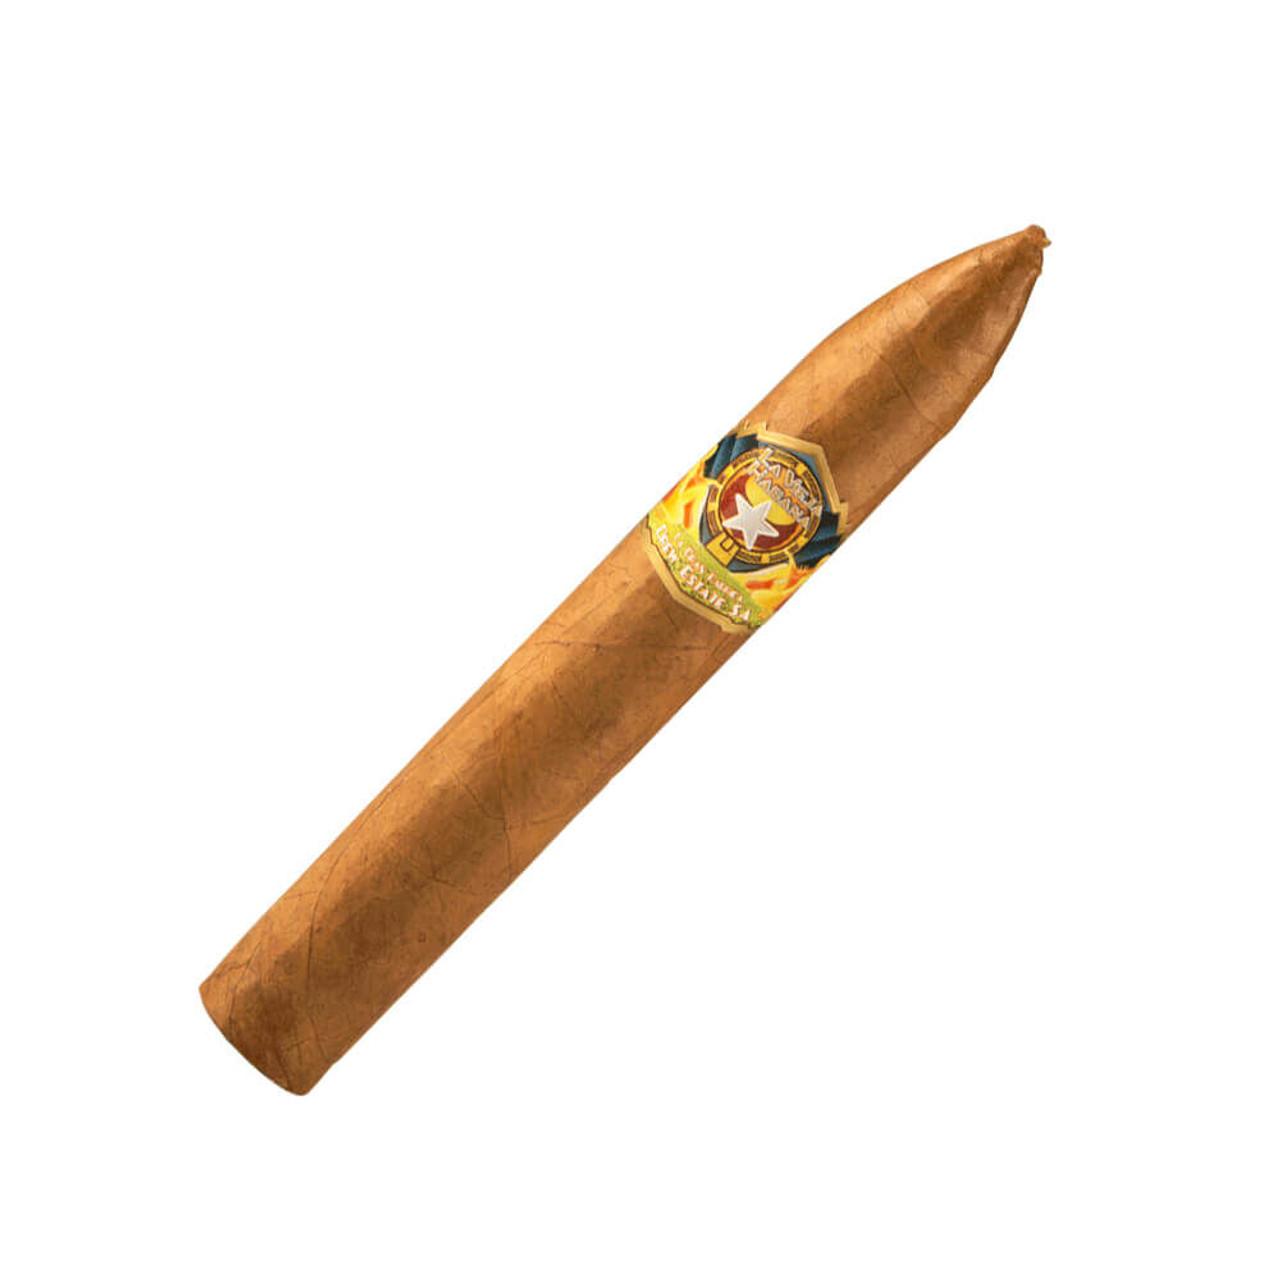 La Vieja Habana Belicoso D Cigars - 6 x 52 (Box of 20)